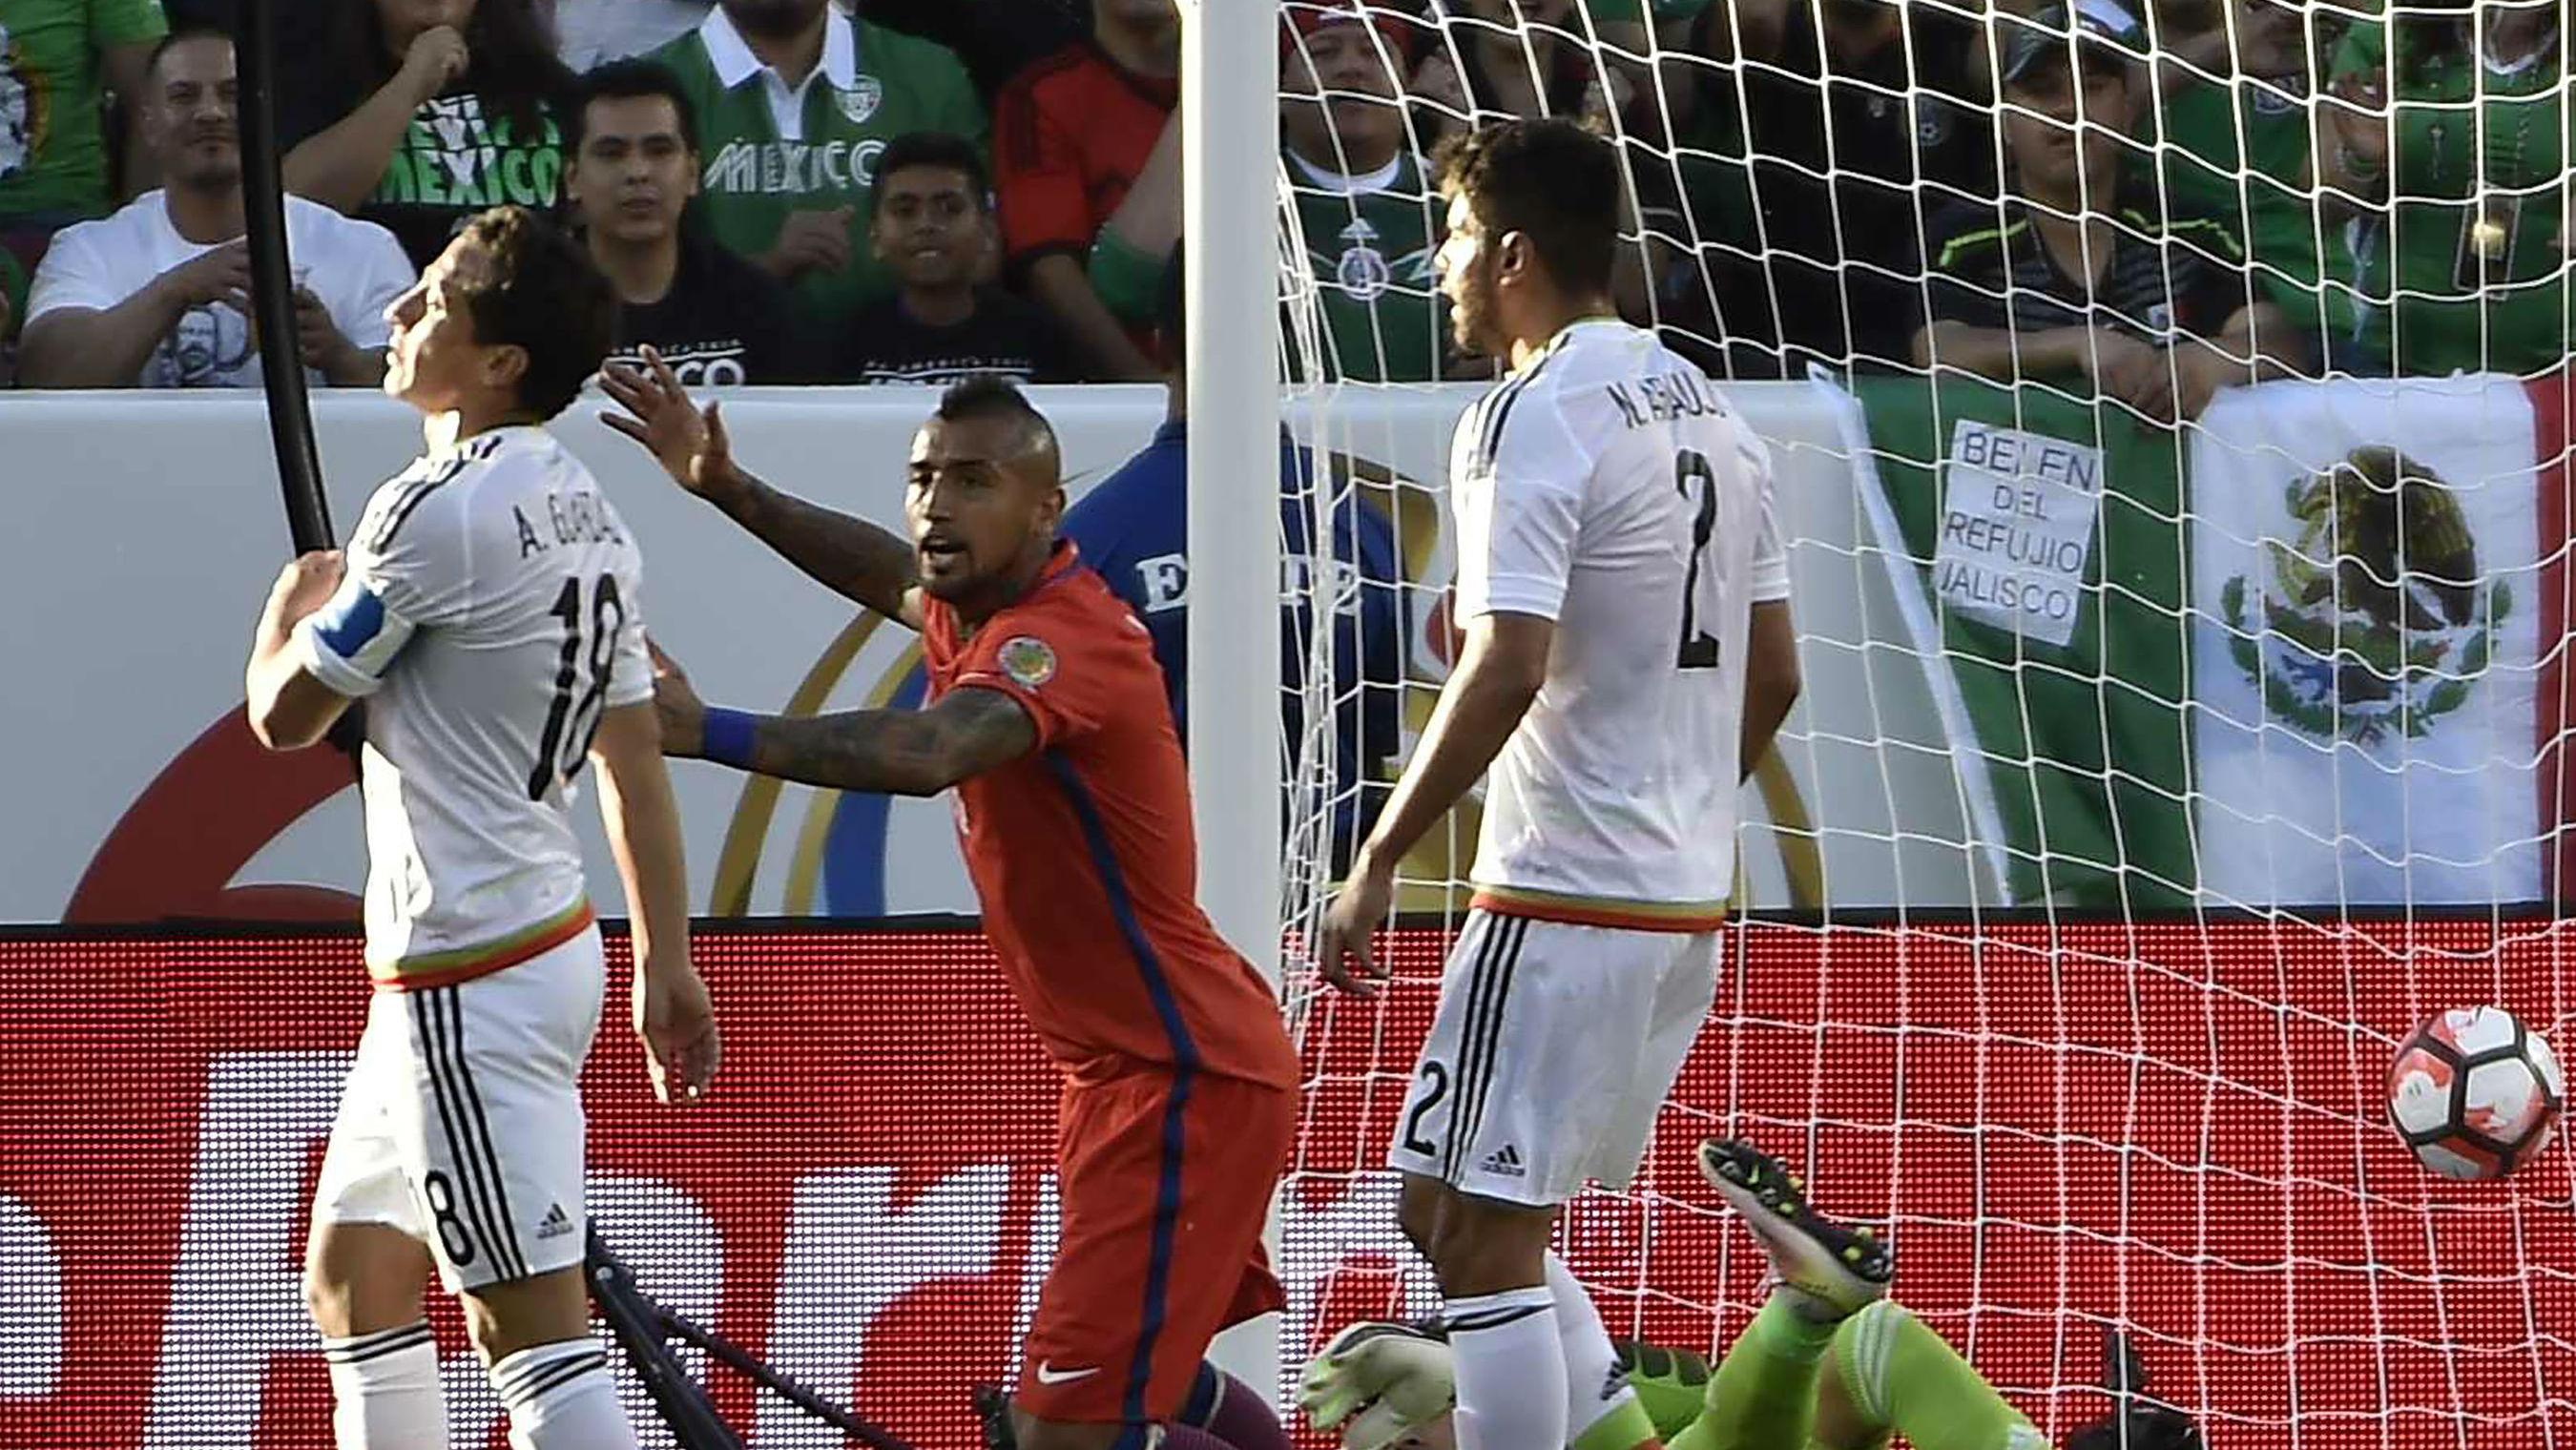 Mexico humiliated by precise Chile in 7-0 blowout loss in Copa America quarterfinals